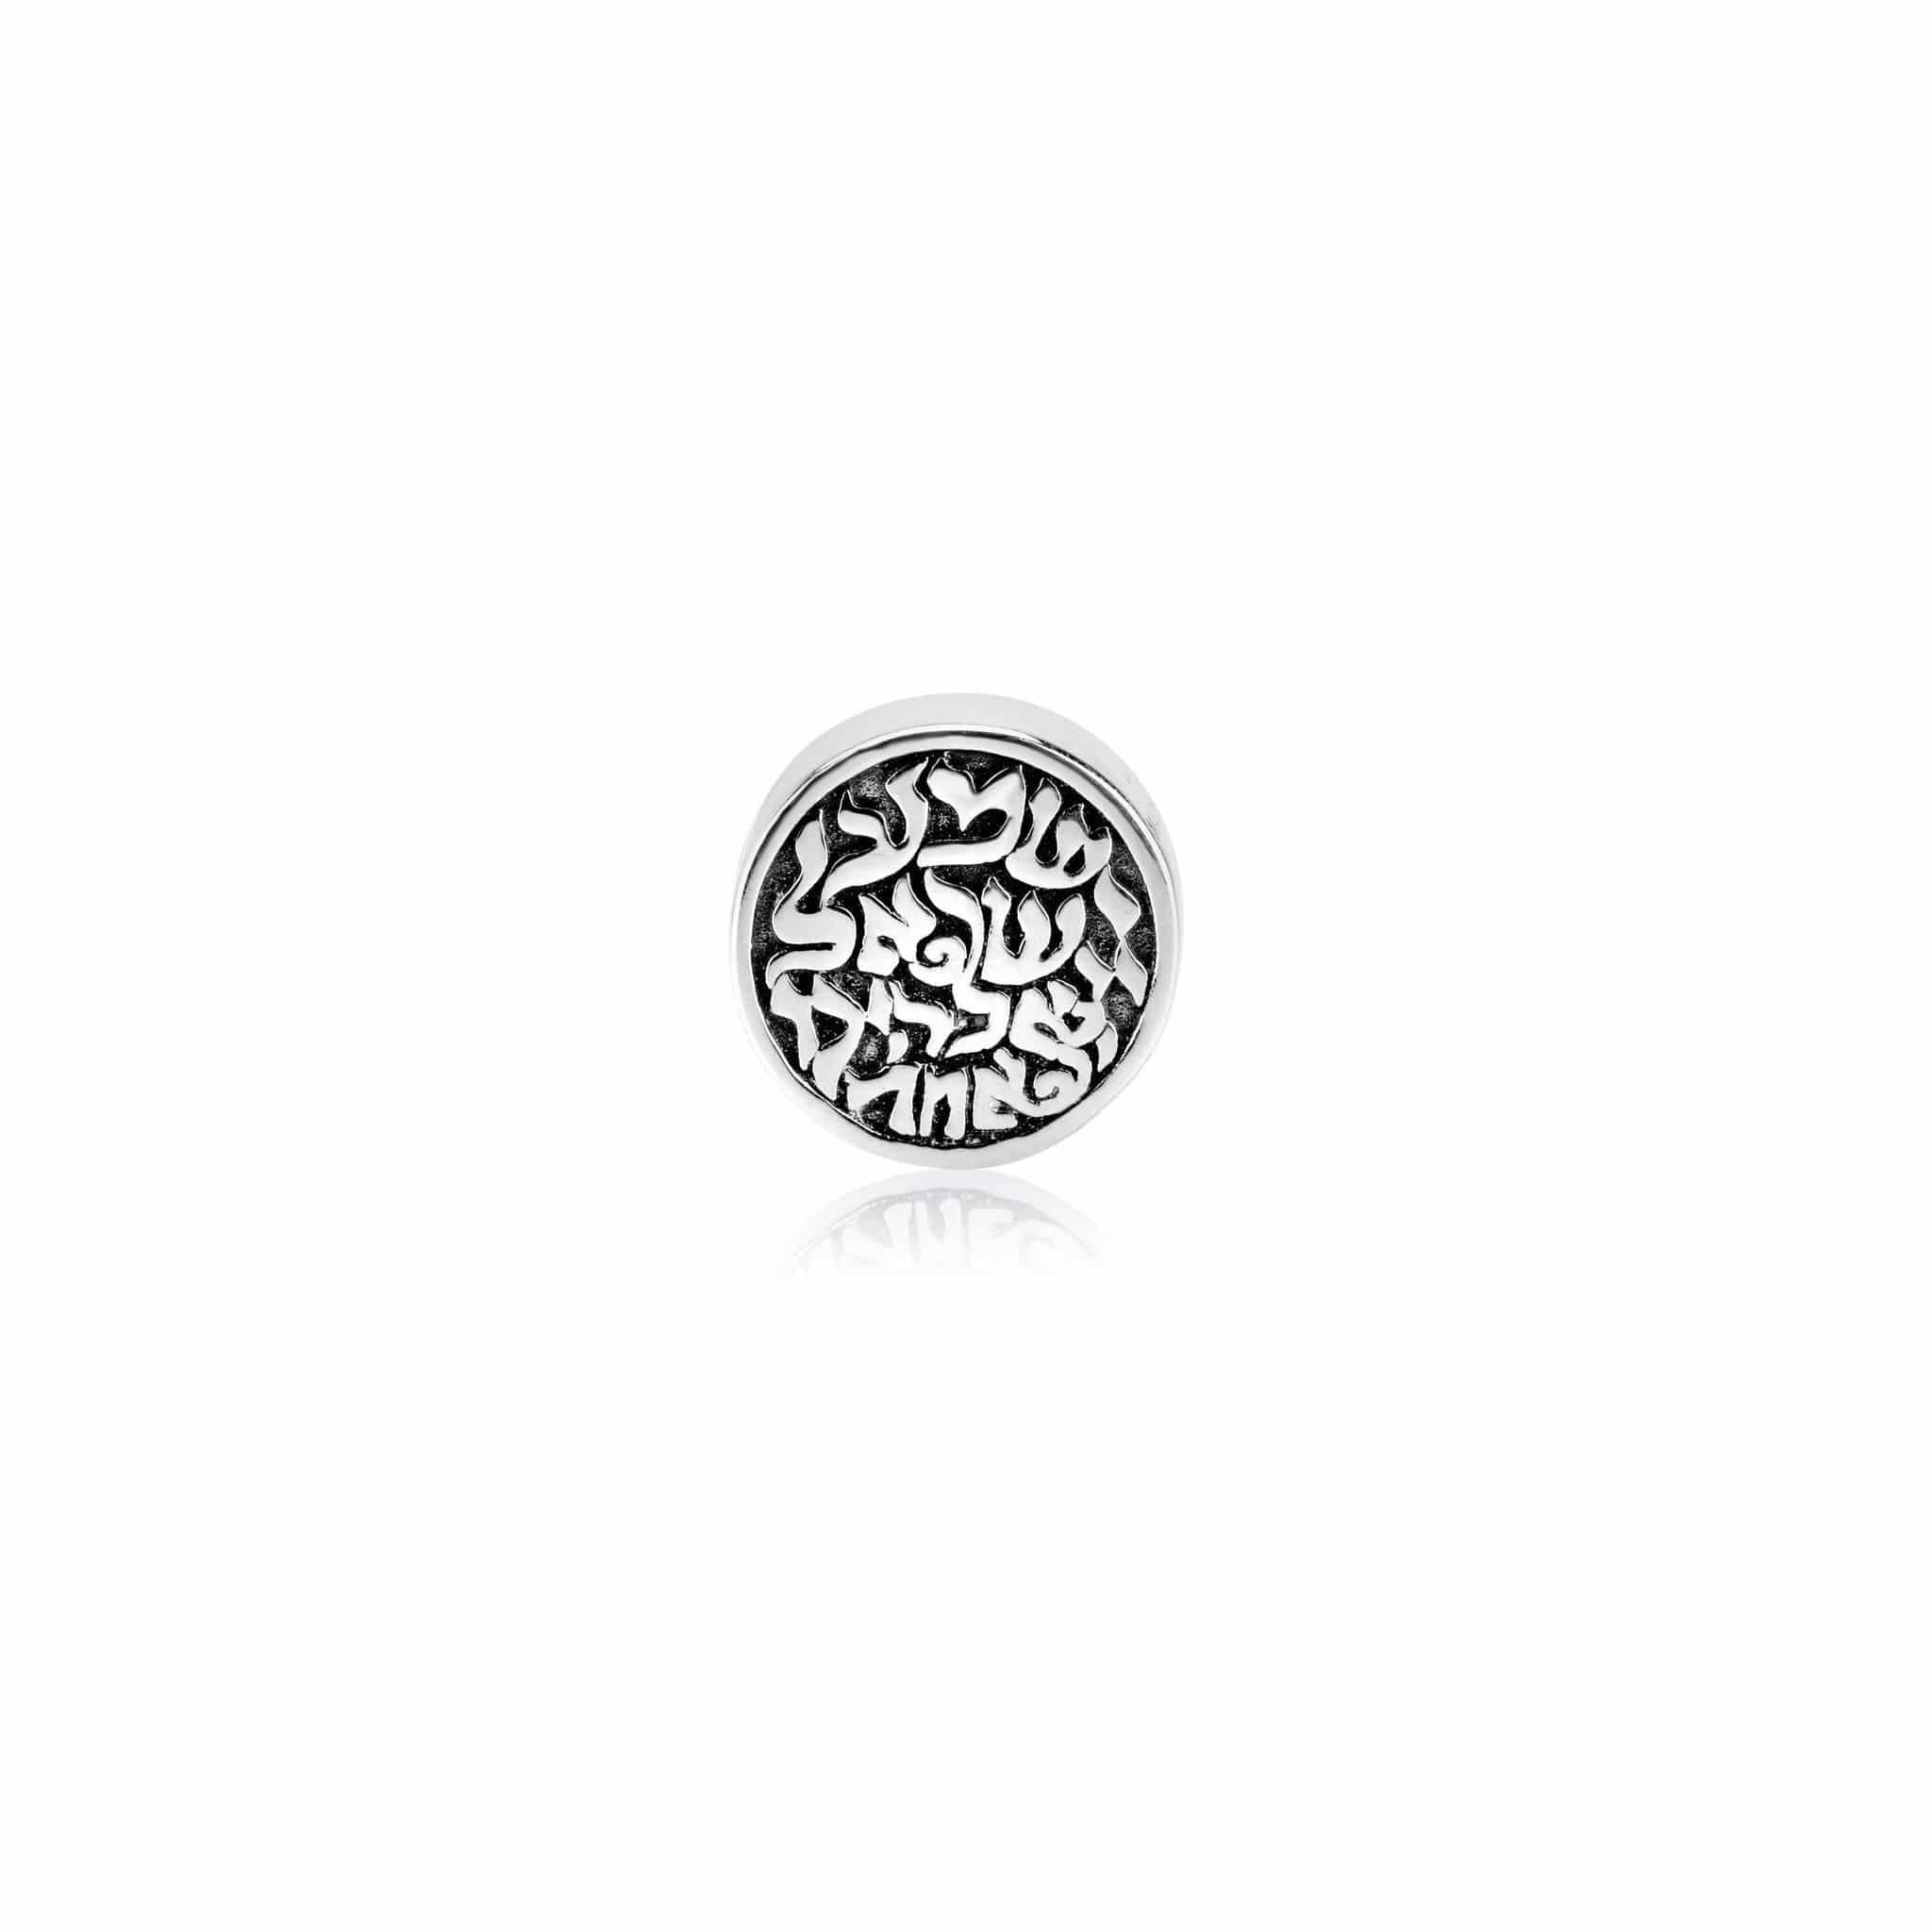 Plata esterlina 925 abalorio colgador shma israel